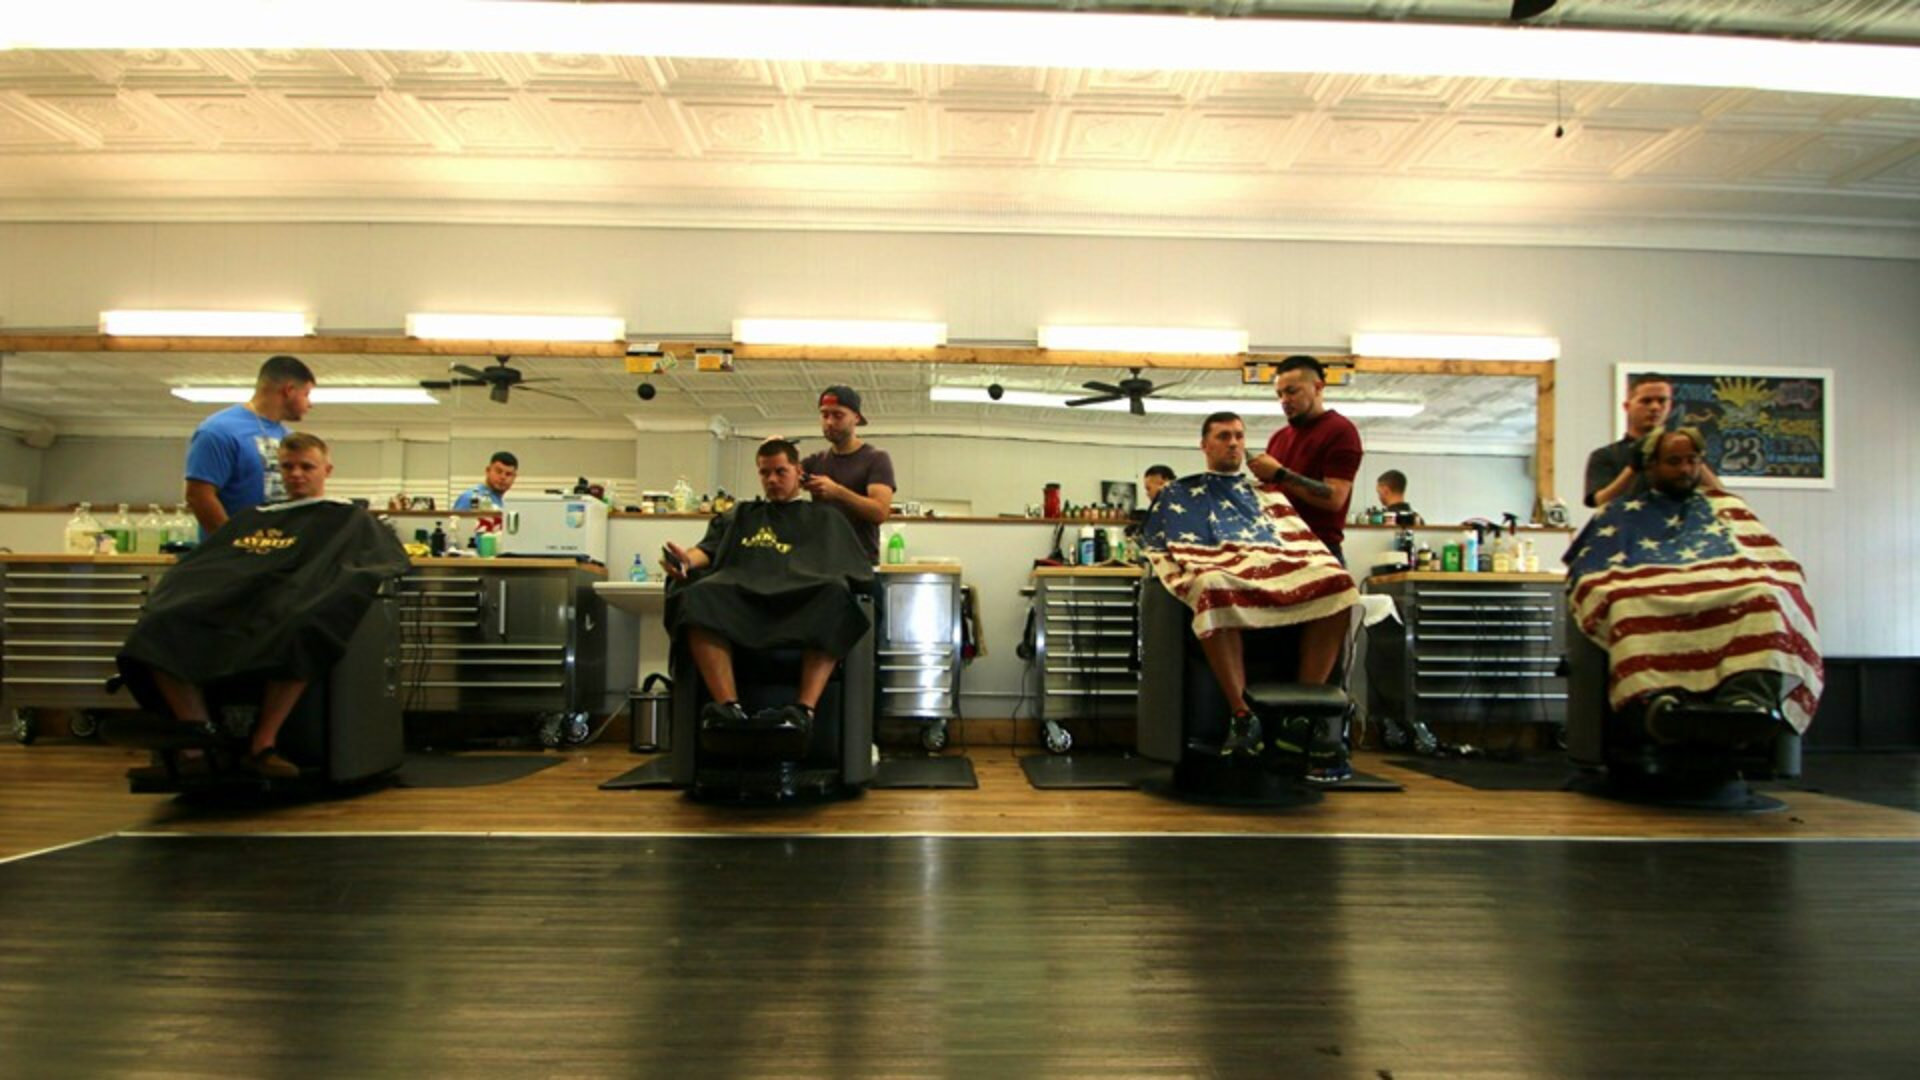 Heirloom Barber and Shave Shop